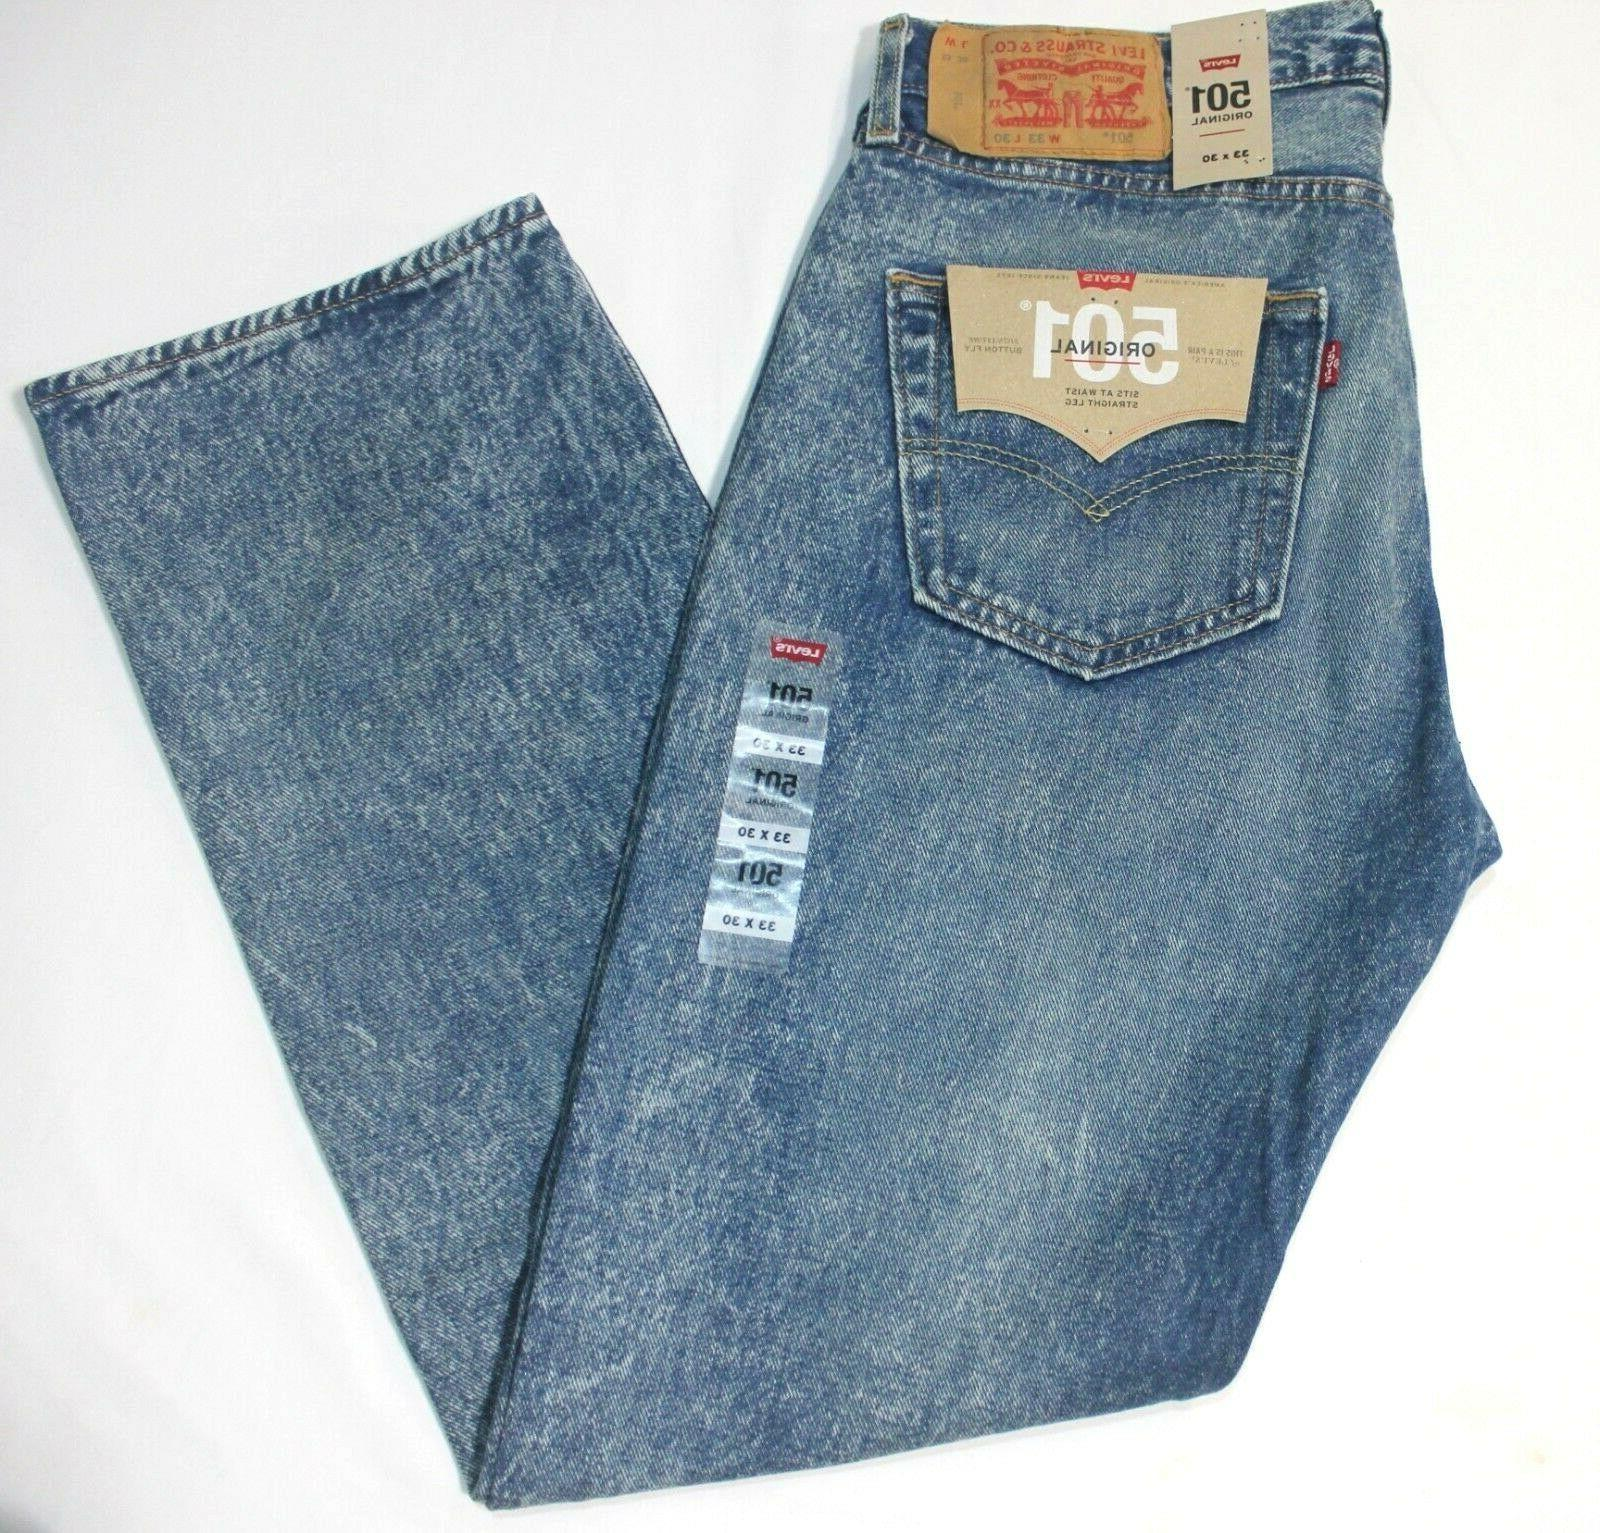 Men's 501 Stone Age Leg Button Jeans -